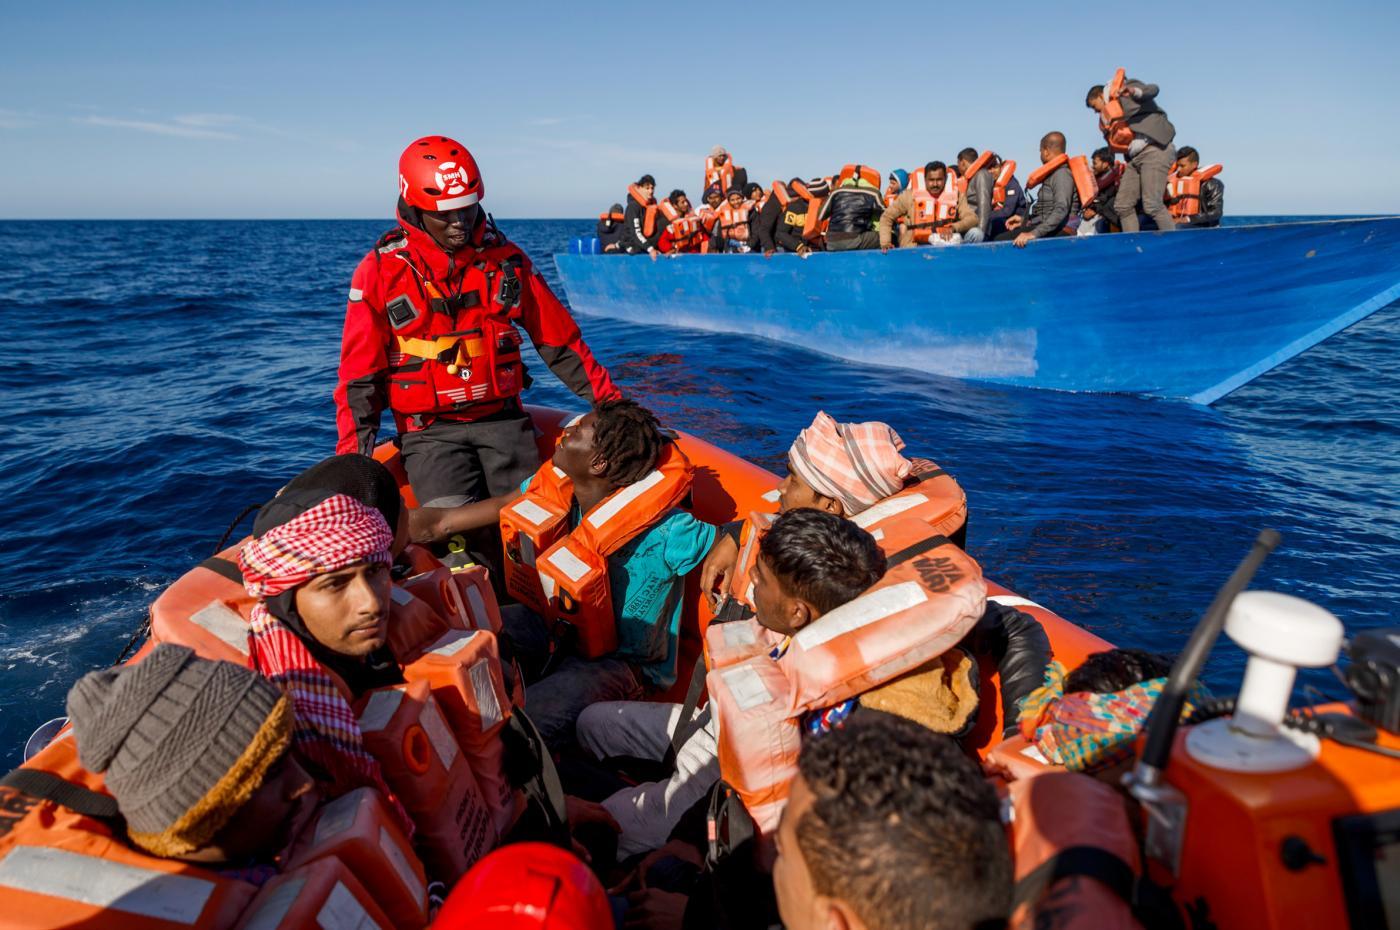 'The Game': The Gamble Bangladeshis Take in Libya to Reach Europe